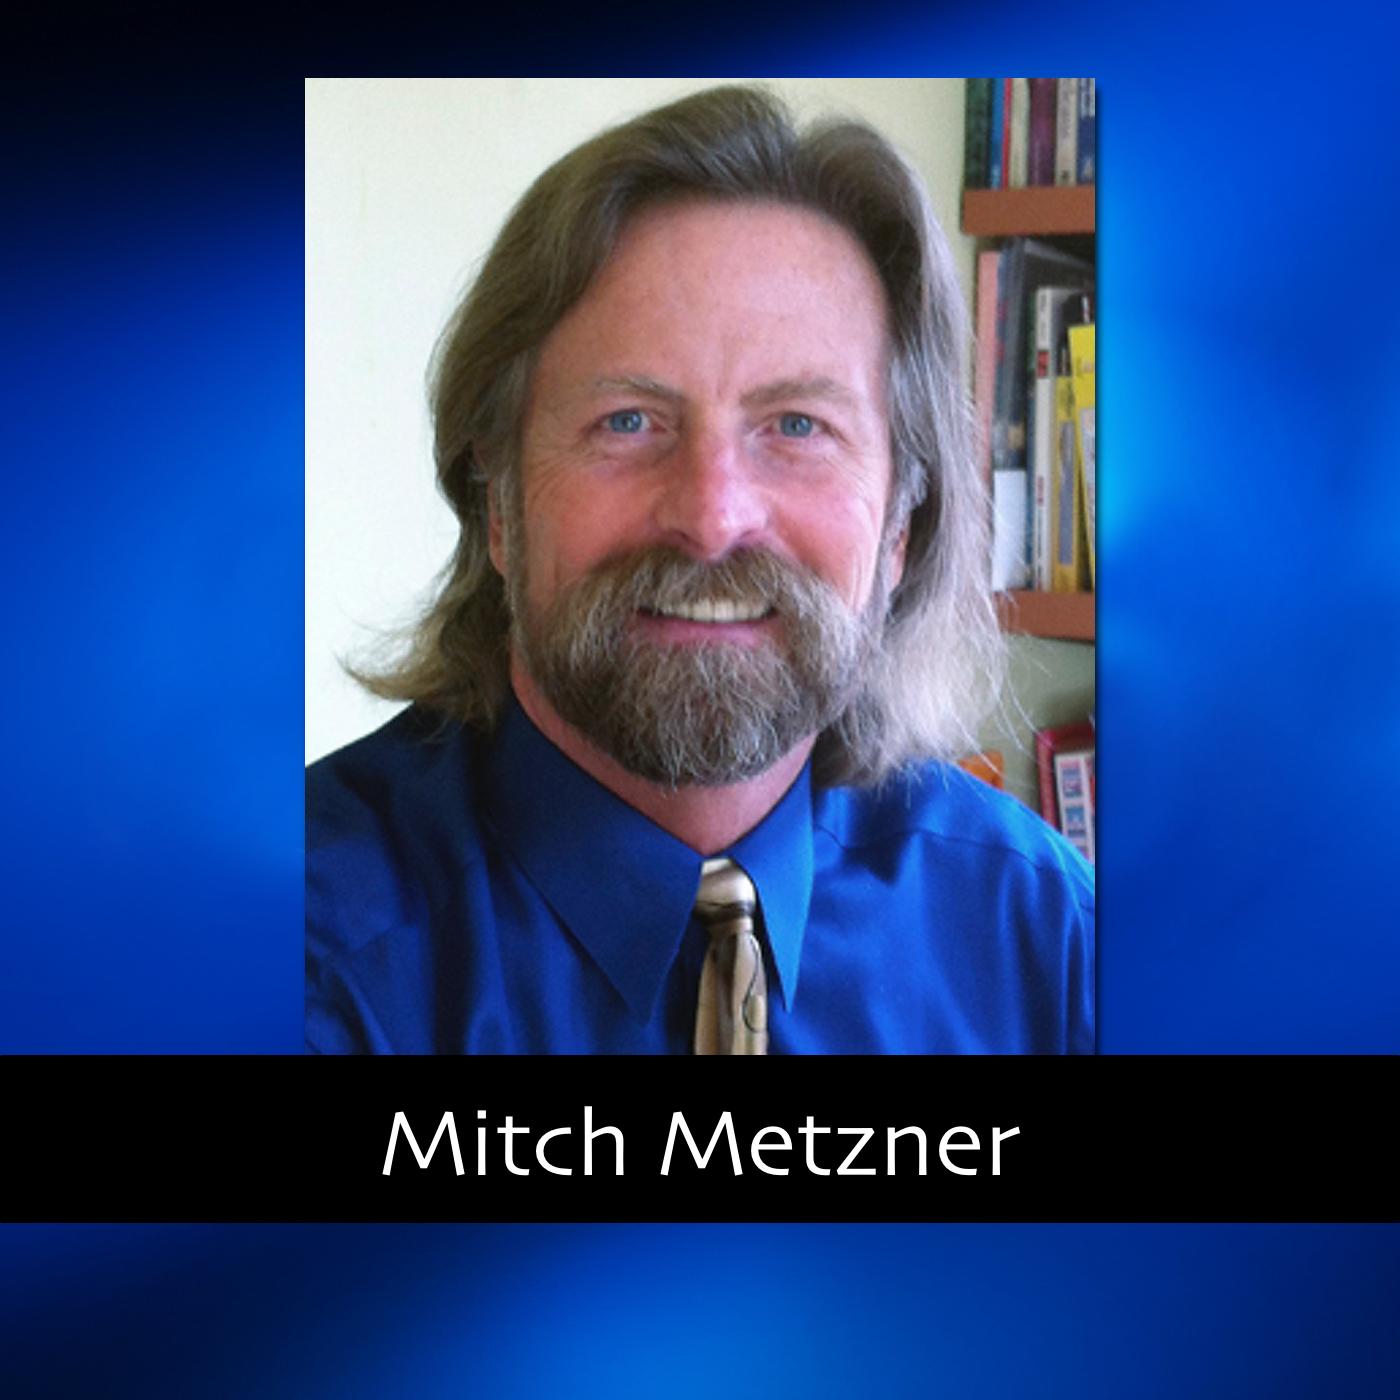 Mitch Metzner thumb.jpg